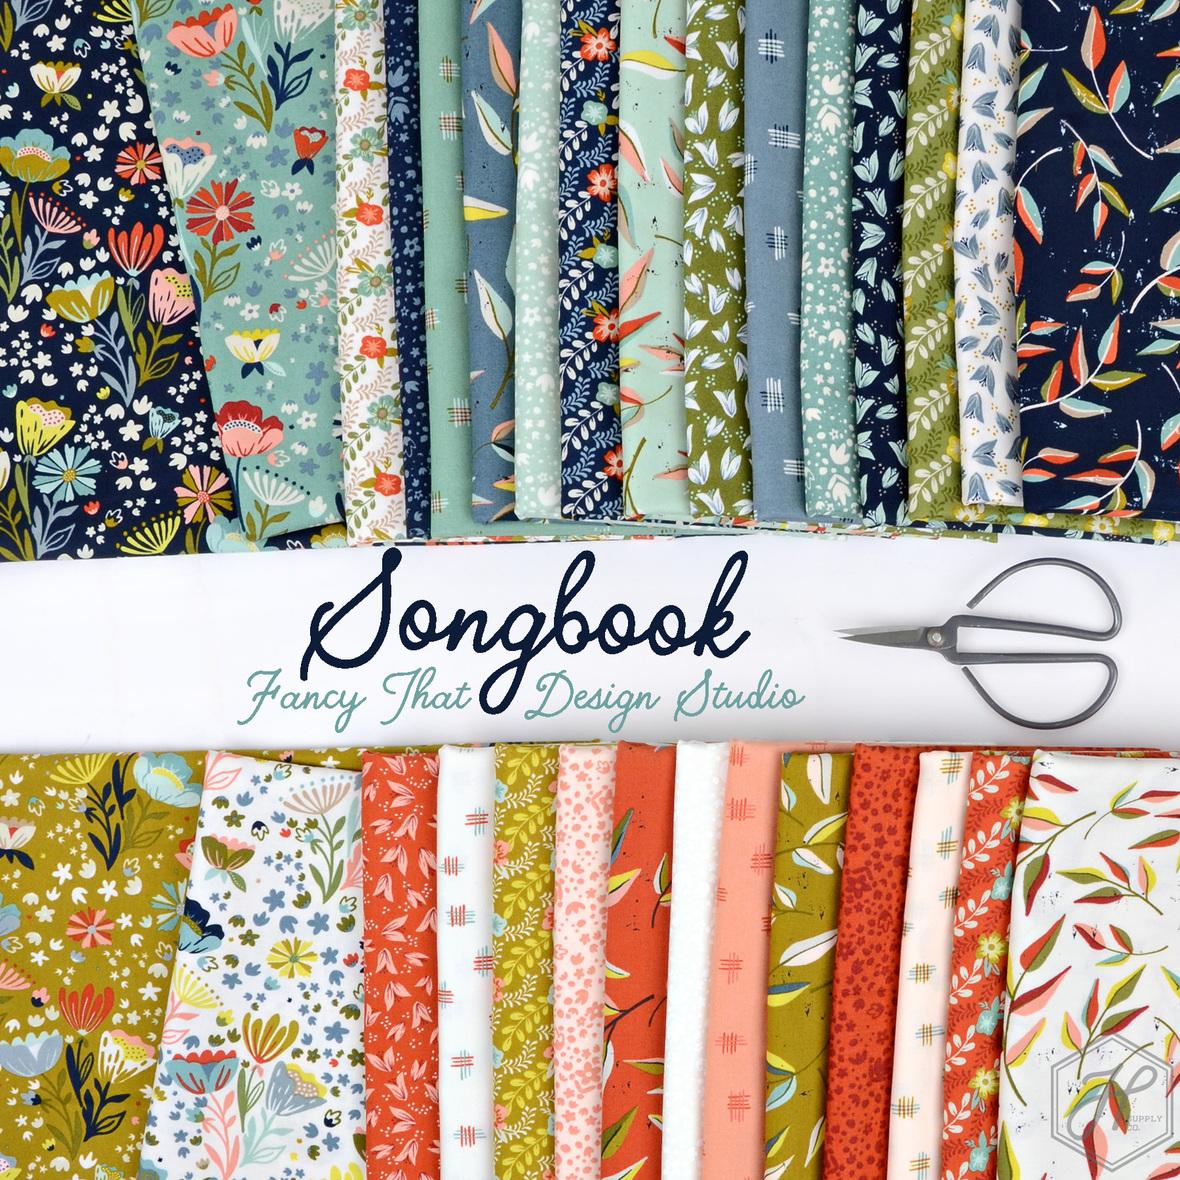 Songbook Fabric Fancy That Design Studio